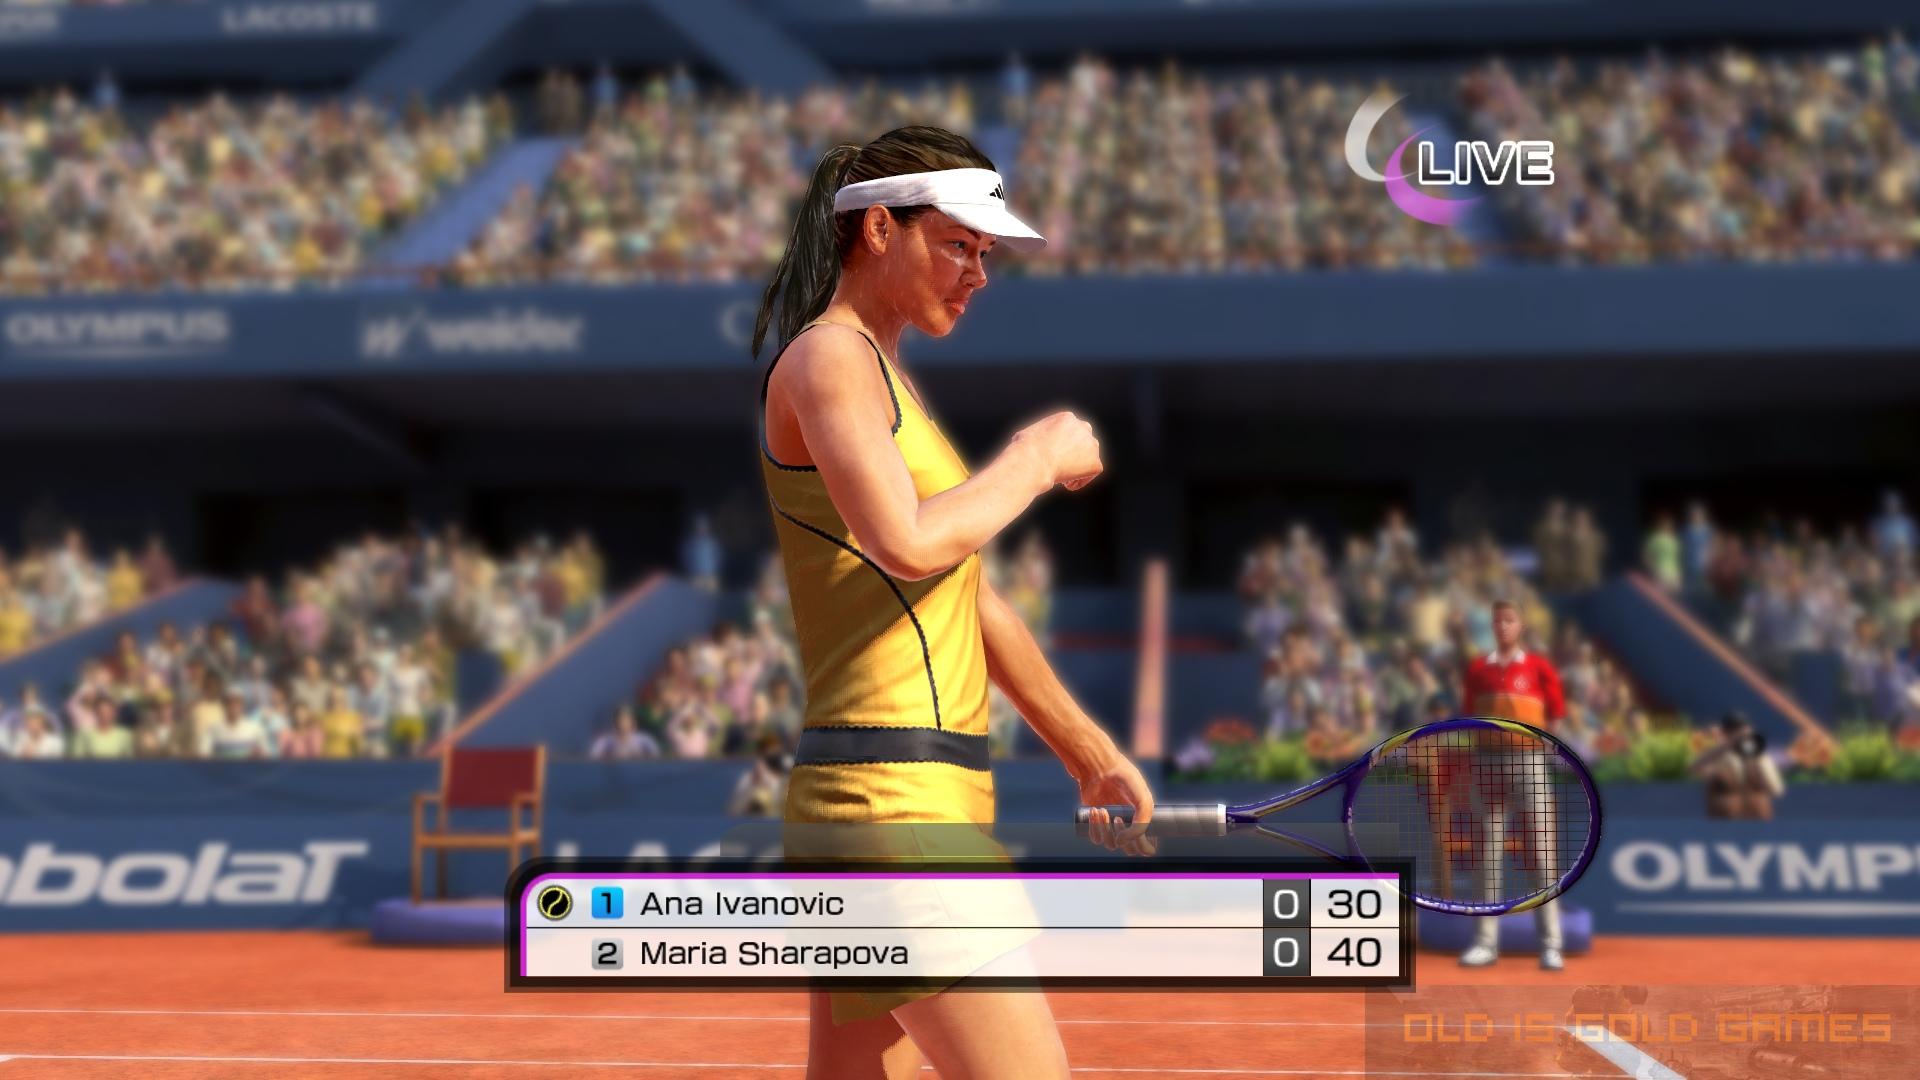 Virtua Tennis 4 Download For Free